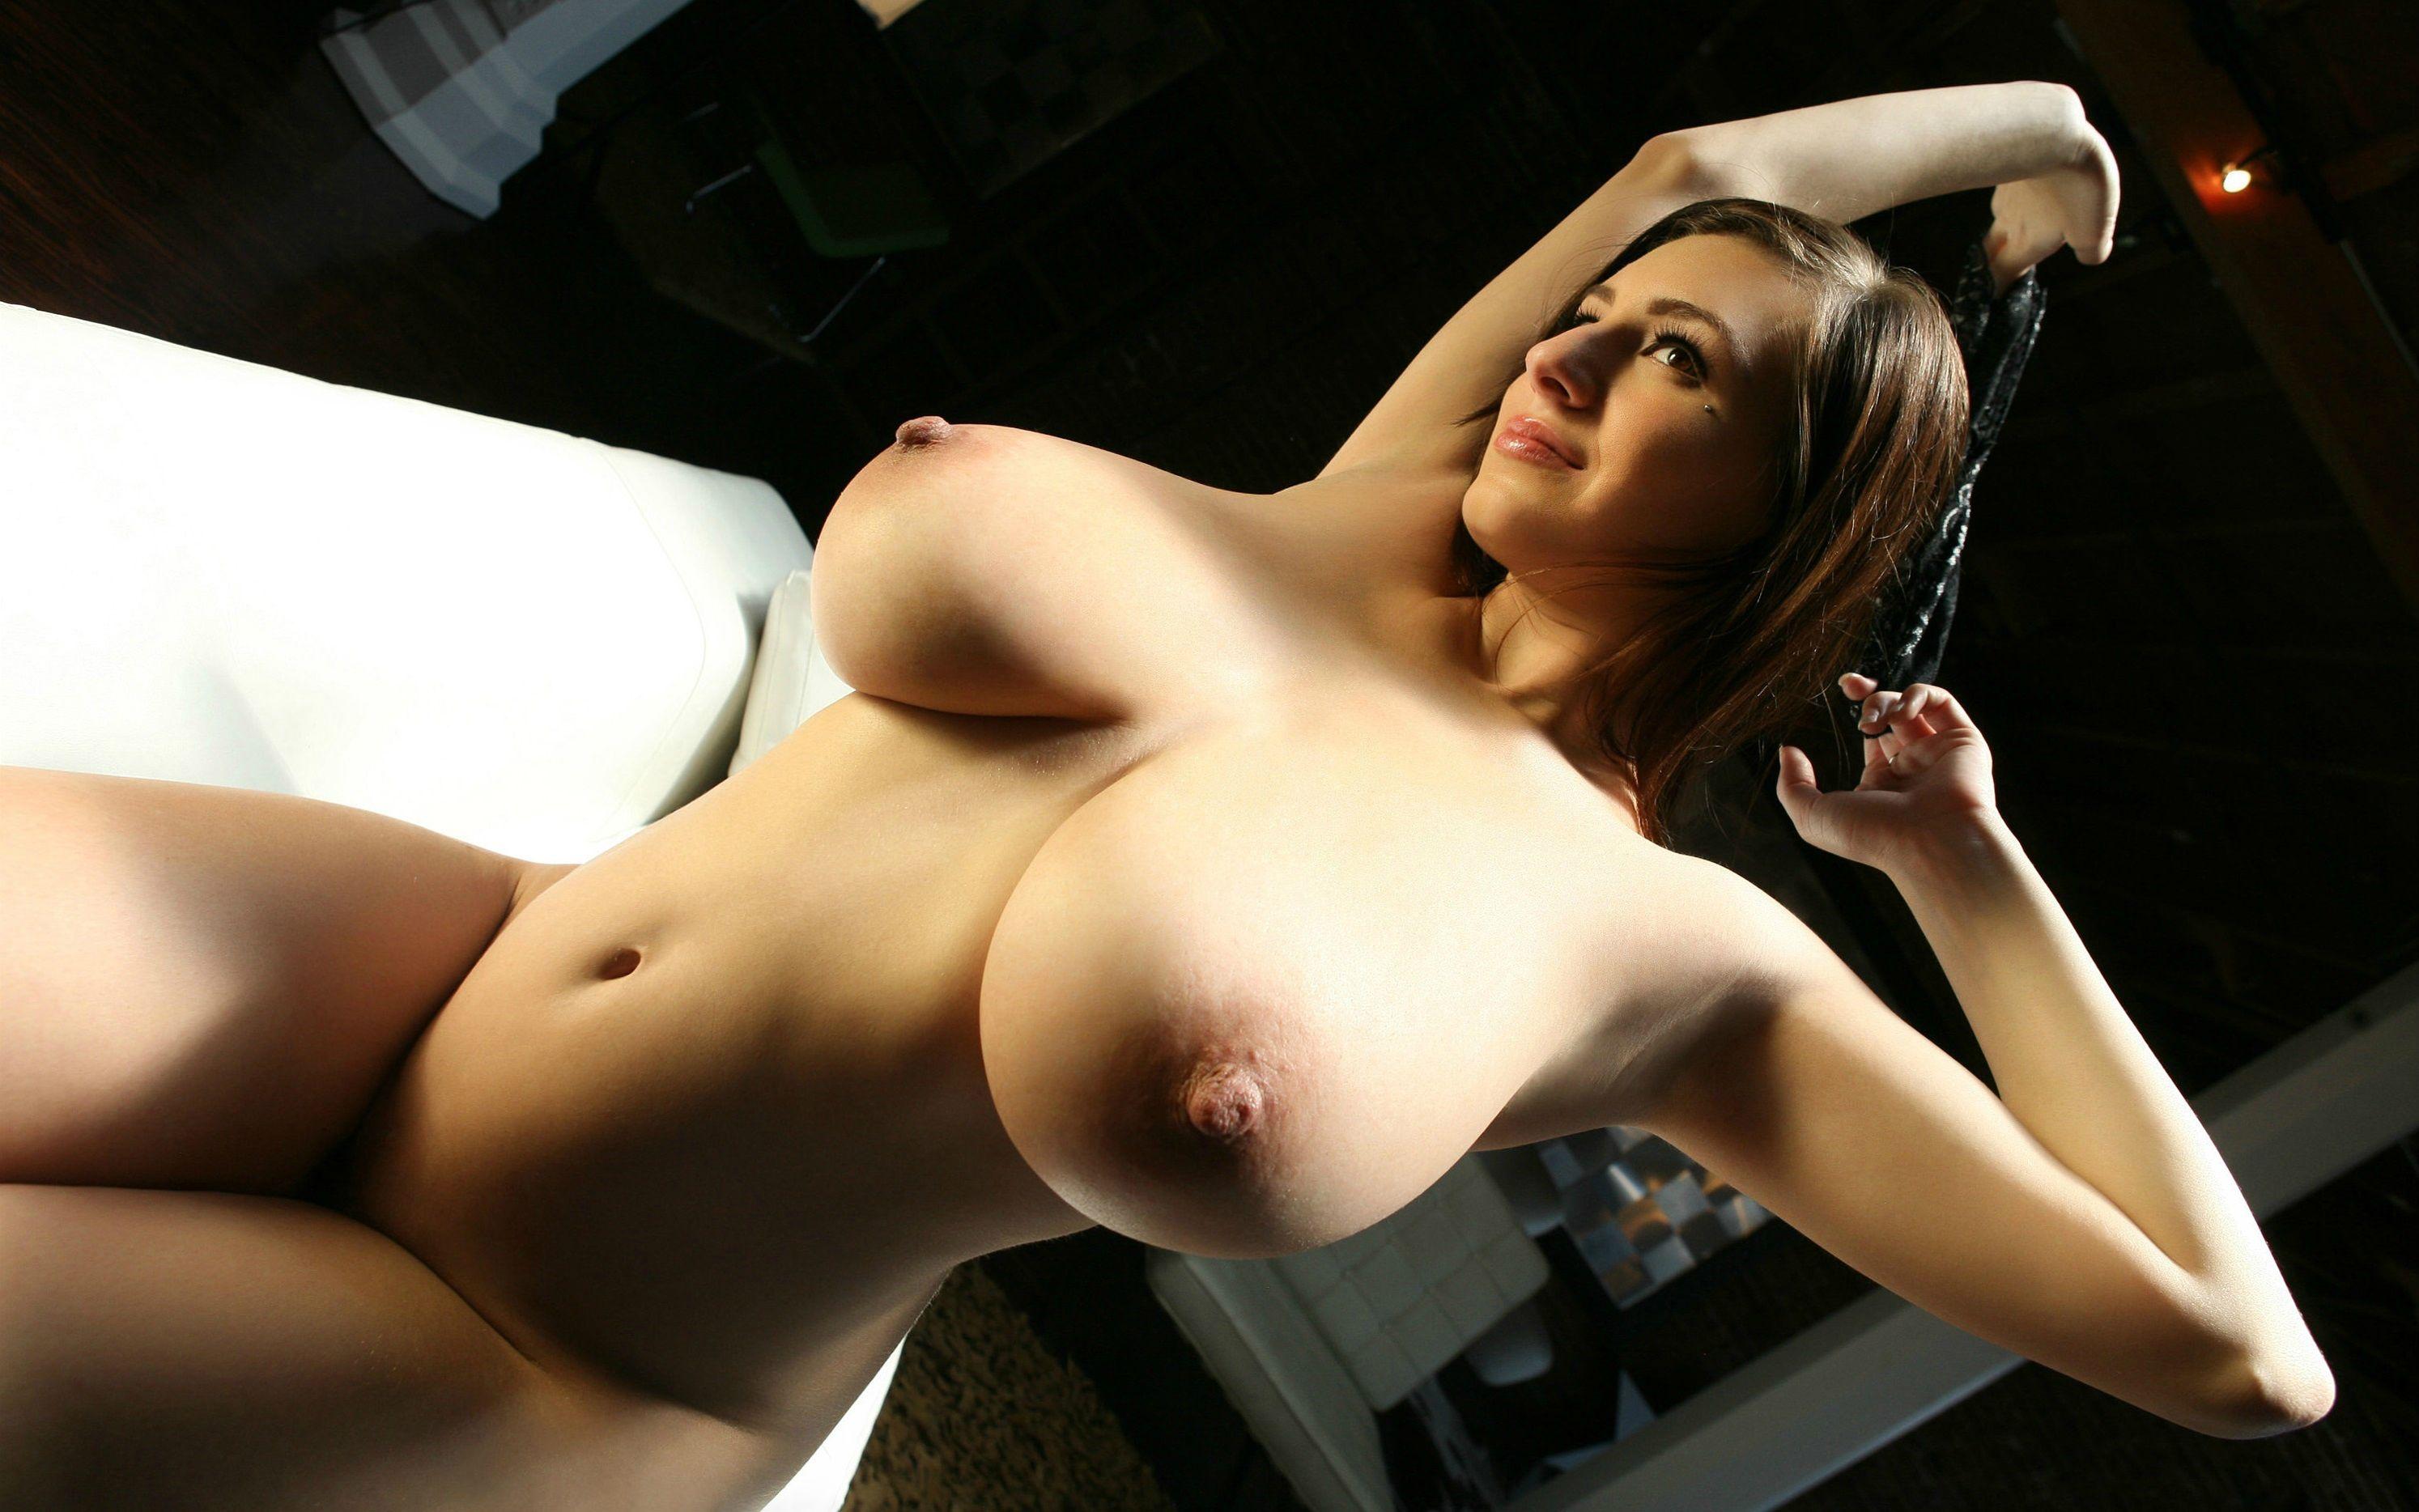 foto-golie-siski-na-ves-ekran